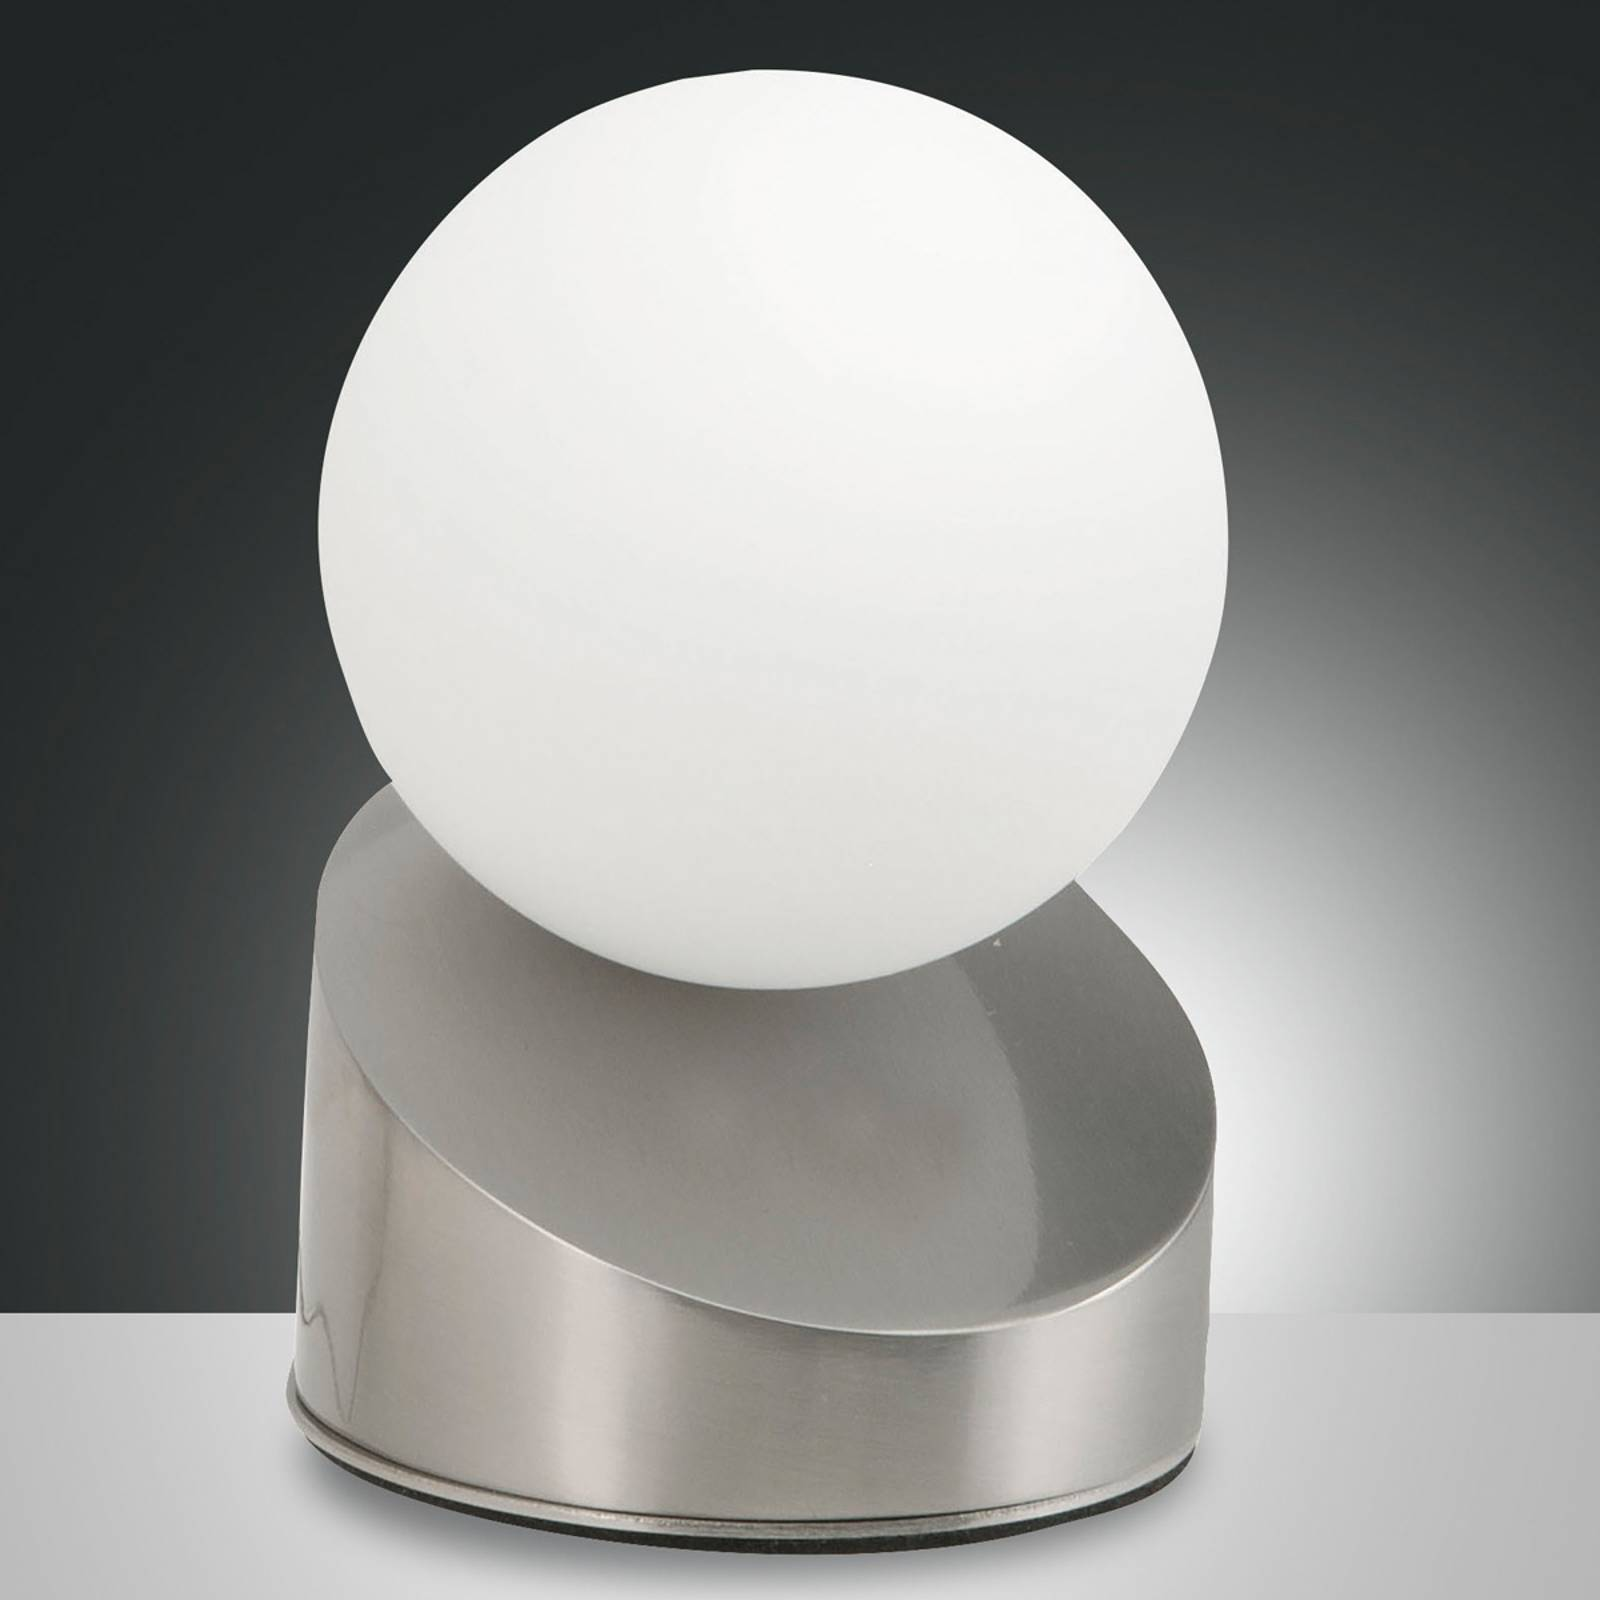 LED tafellamp Gravity, nikkel